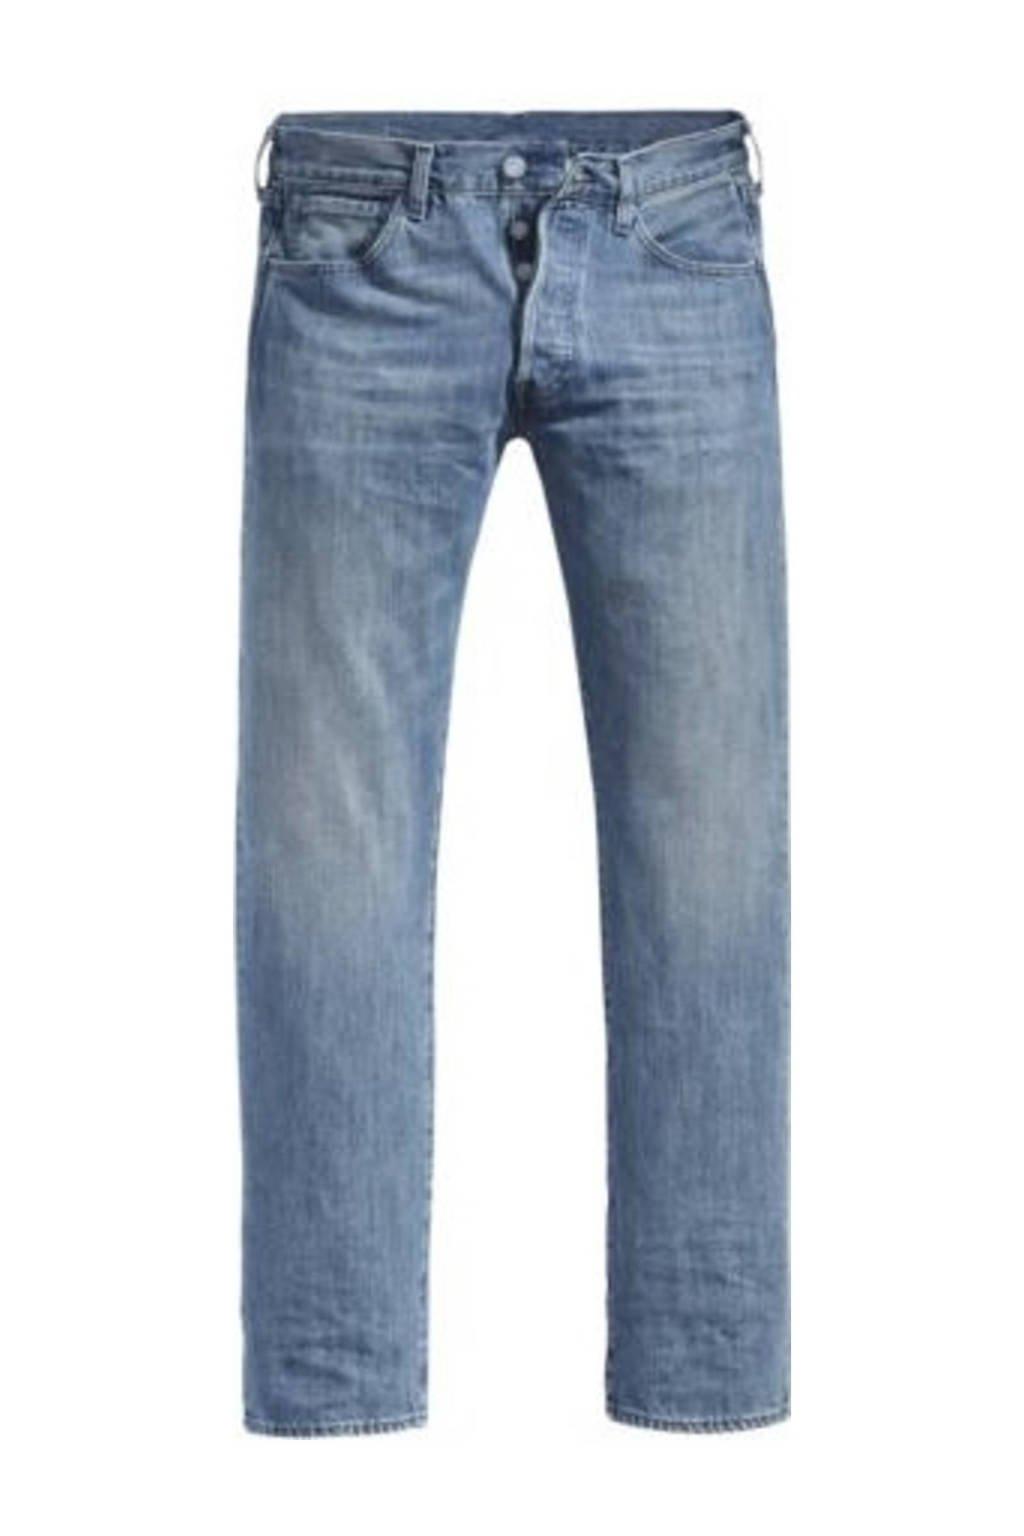 Levi's Big and Tall straight fit jeans 501 light indigo worn in, T.B. Light Indigo - Worn In